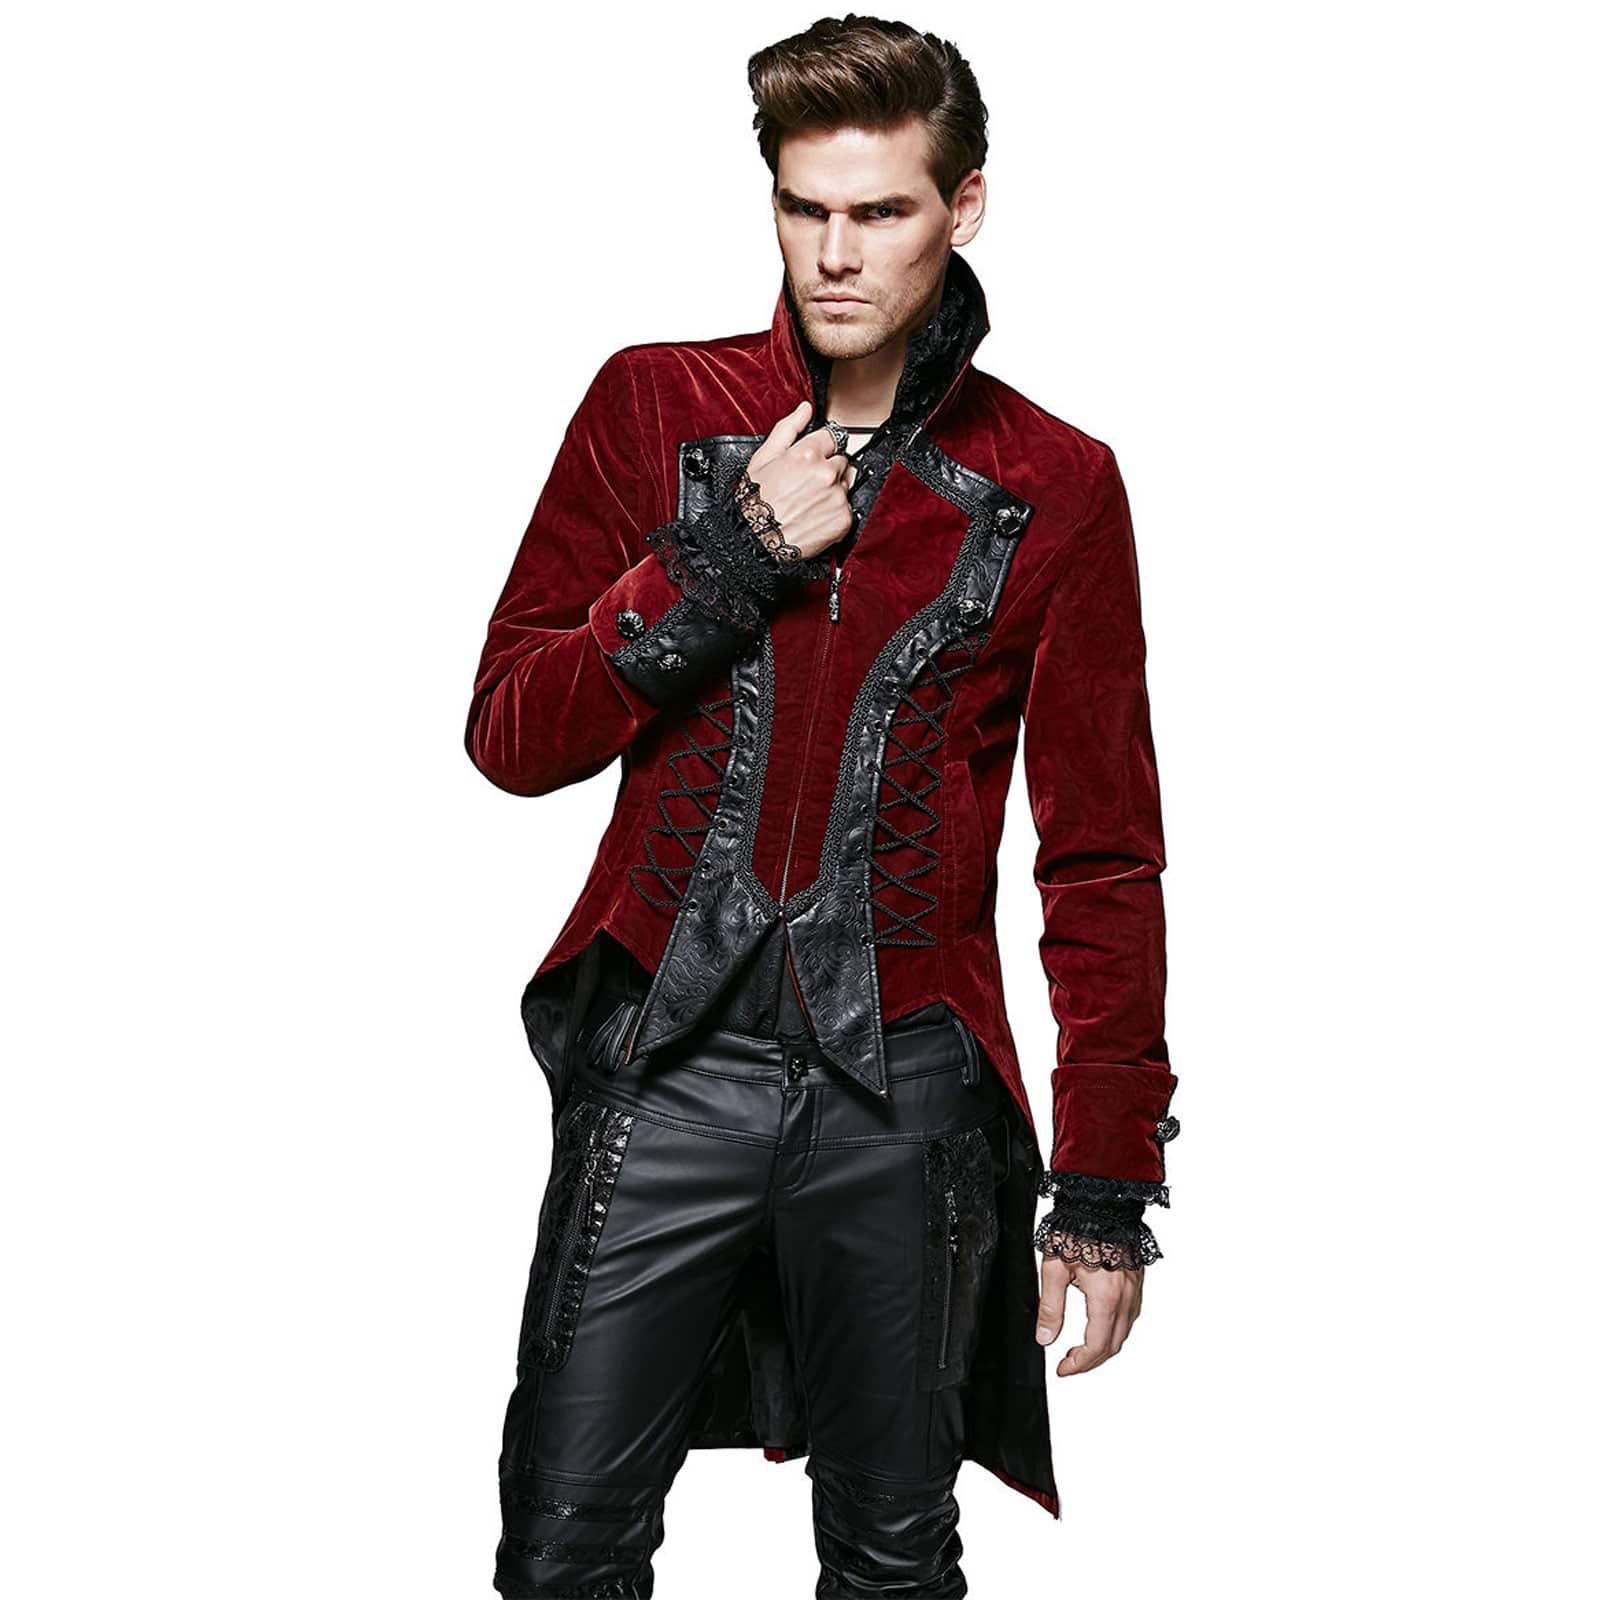 Punk Rave Dandy Mens Red Velvet Jacket Coat Goth VTG Steampunk